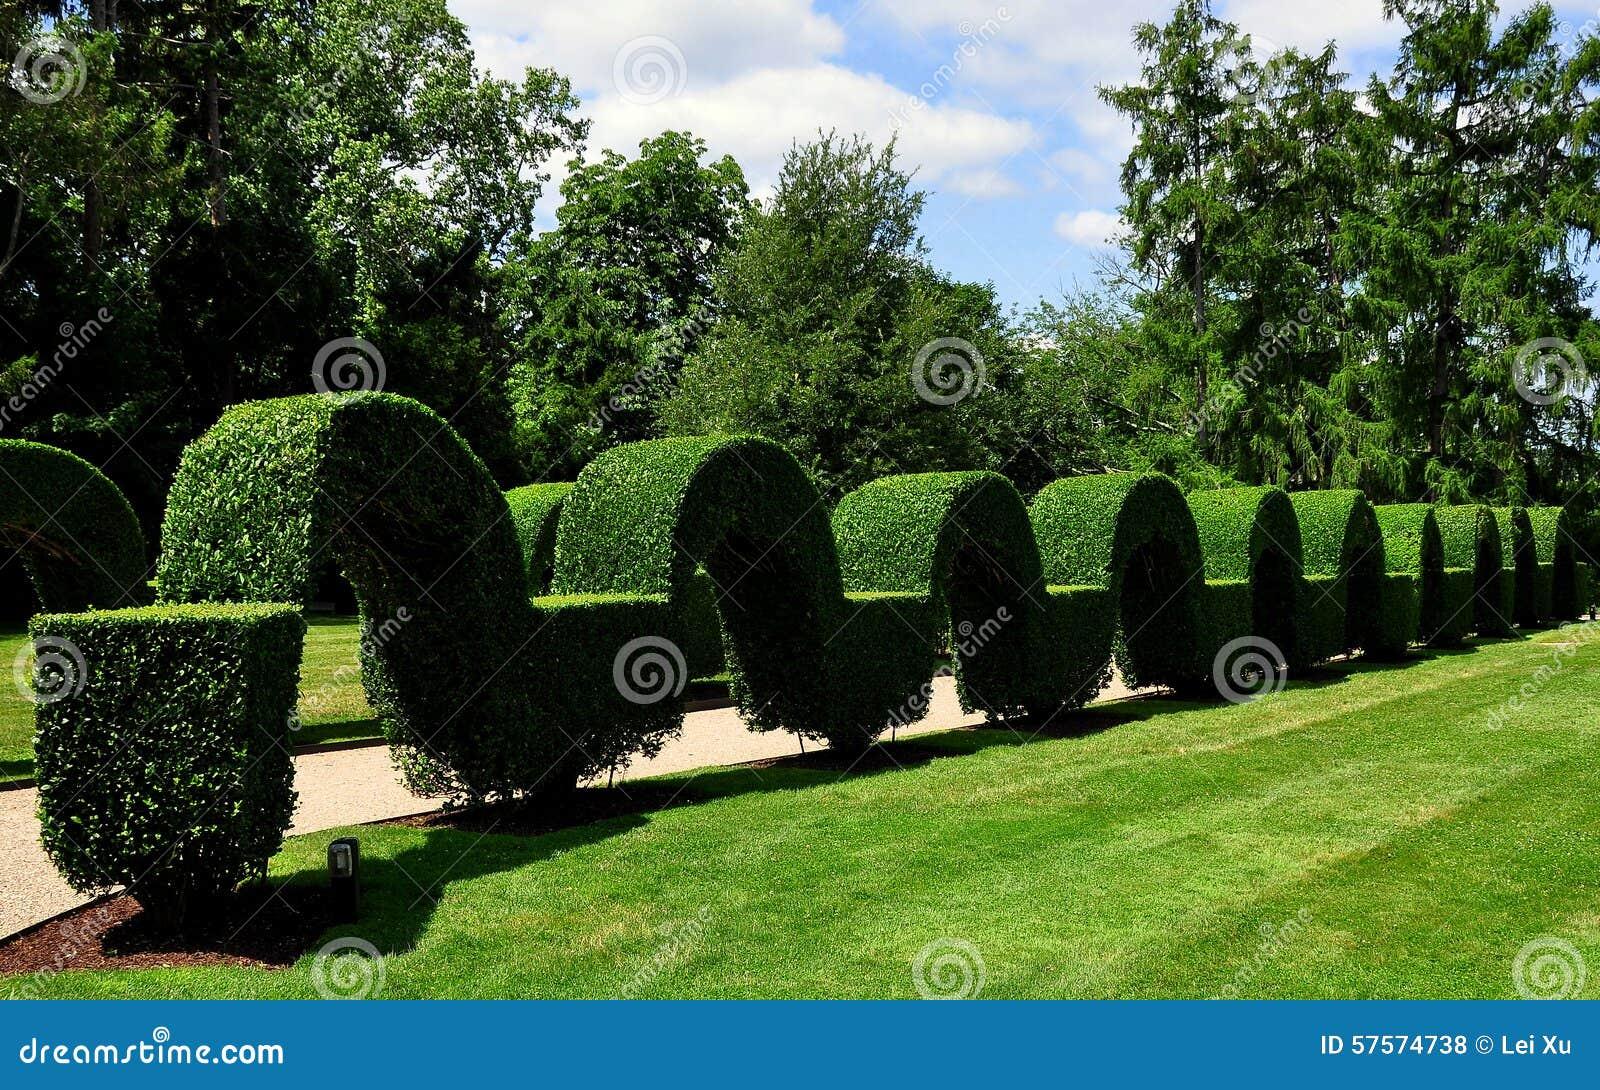 portsmouth ri green animals topiary gardens - Green Animals Topiary Garden